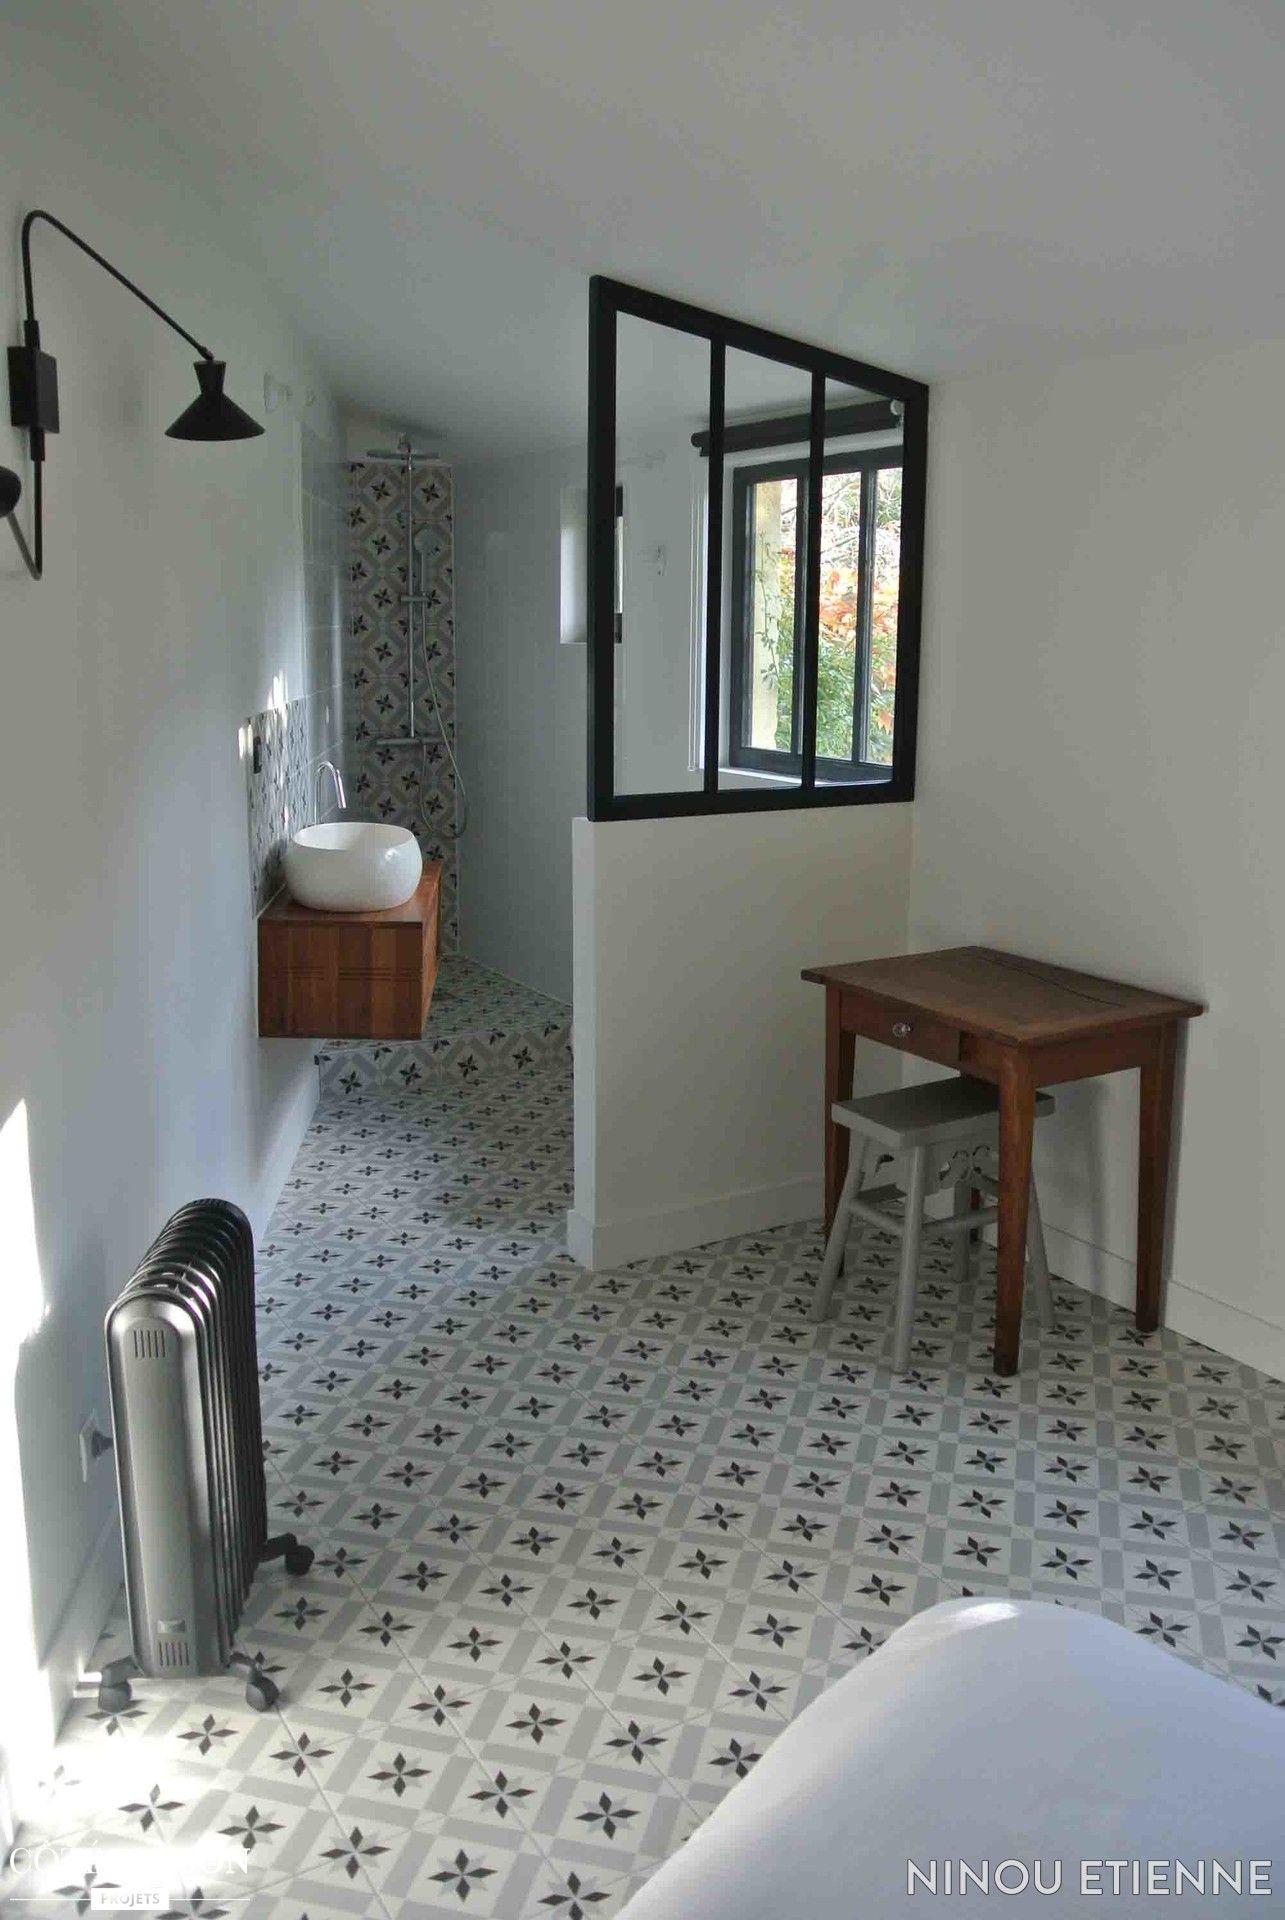 Pin by Carola Heidkamp on Badideen | Pinterest | Bath, Interiors and ...